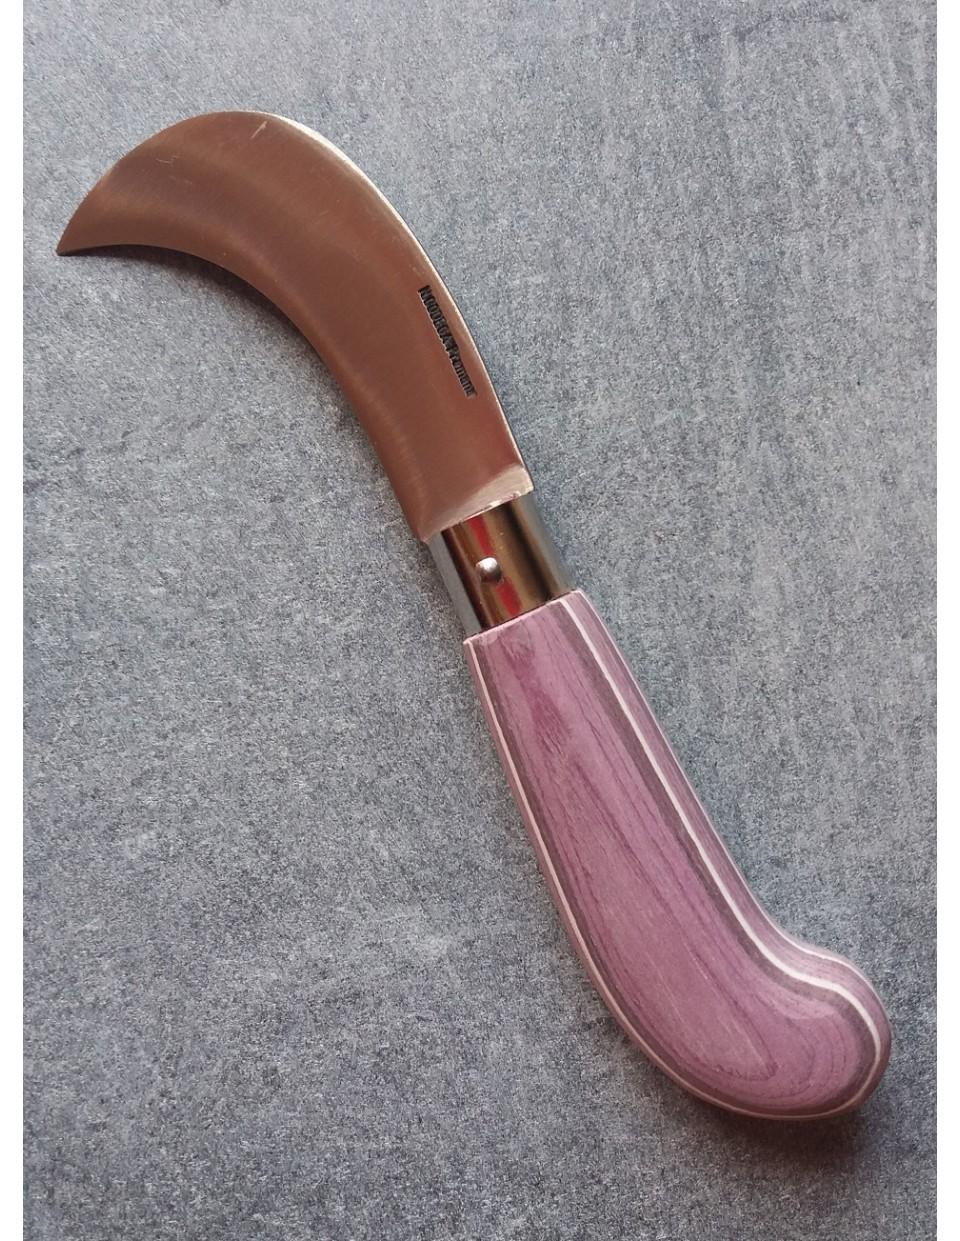 Codega - Roncola Valtellina cm. 8 in legno composto